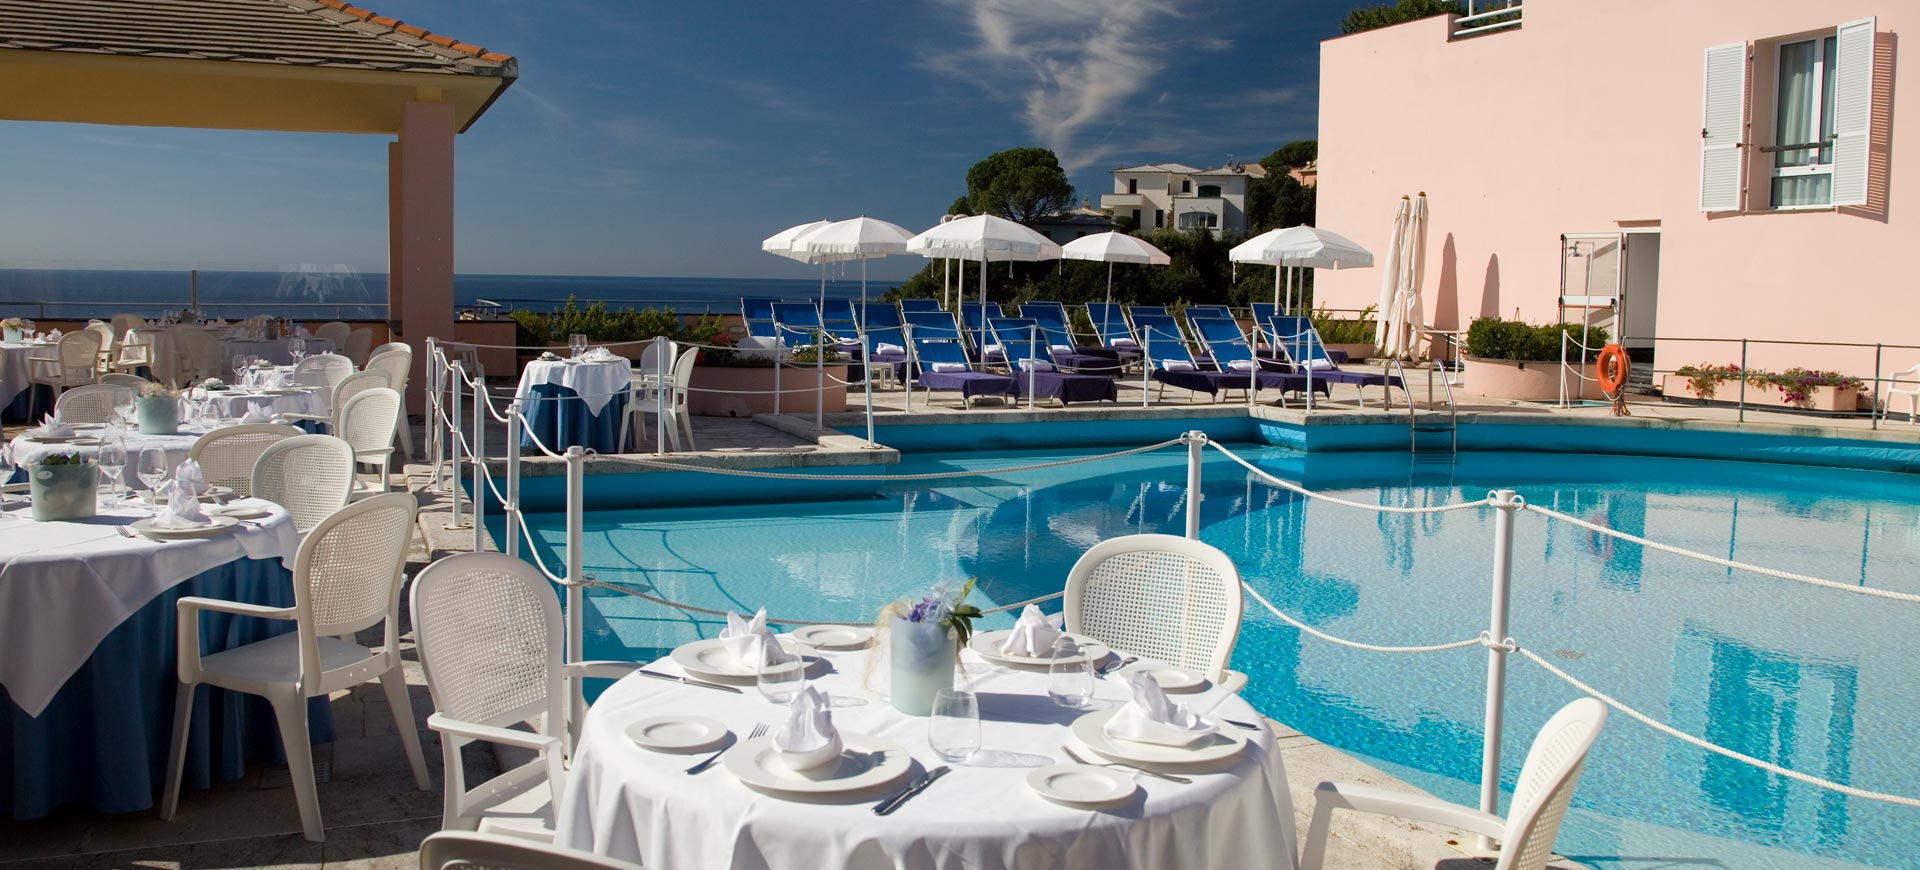 Wedding banquets Arenzano restaurant - Genova